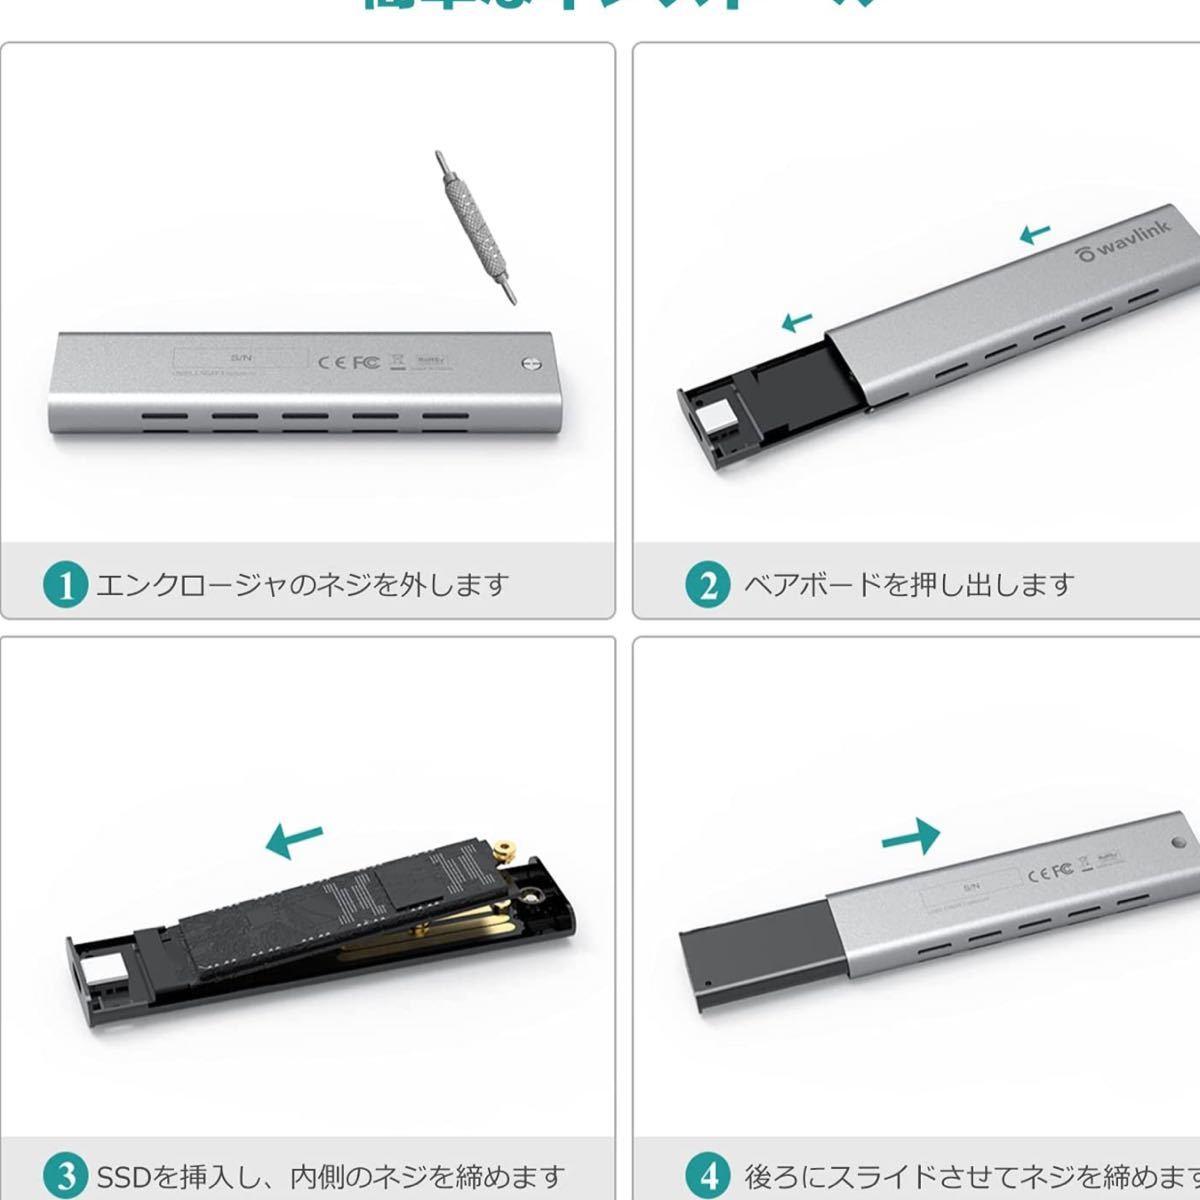 NGFF SSD ケース USB 3.1 Gen2 10Gbps SATA 高速転送 USB3.0 C to A ケーブル付属